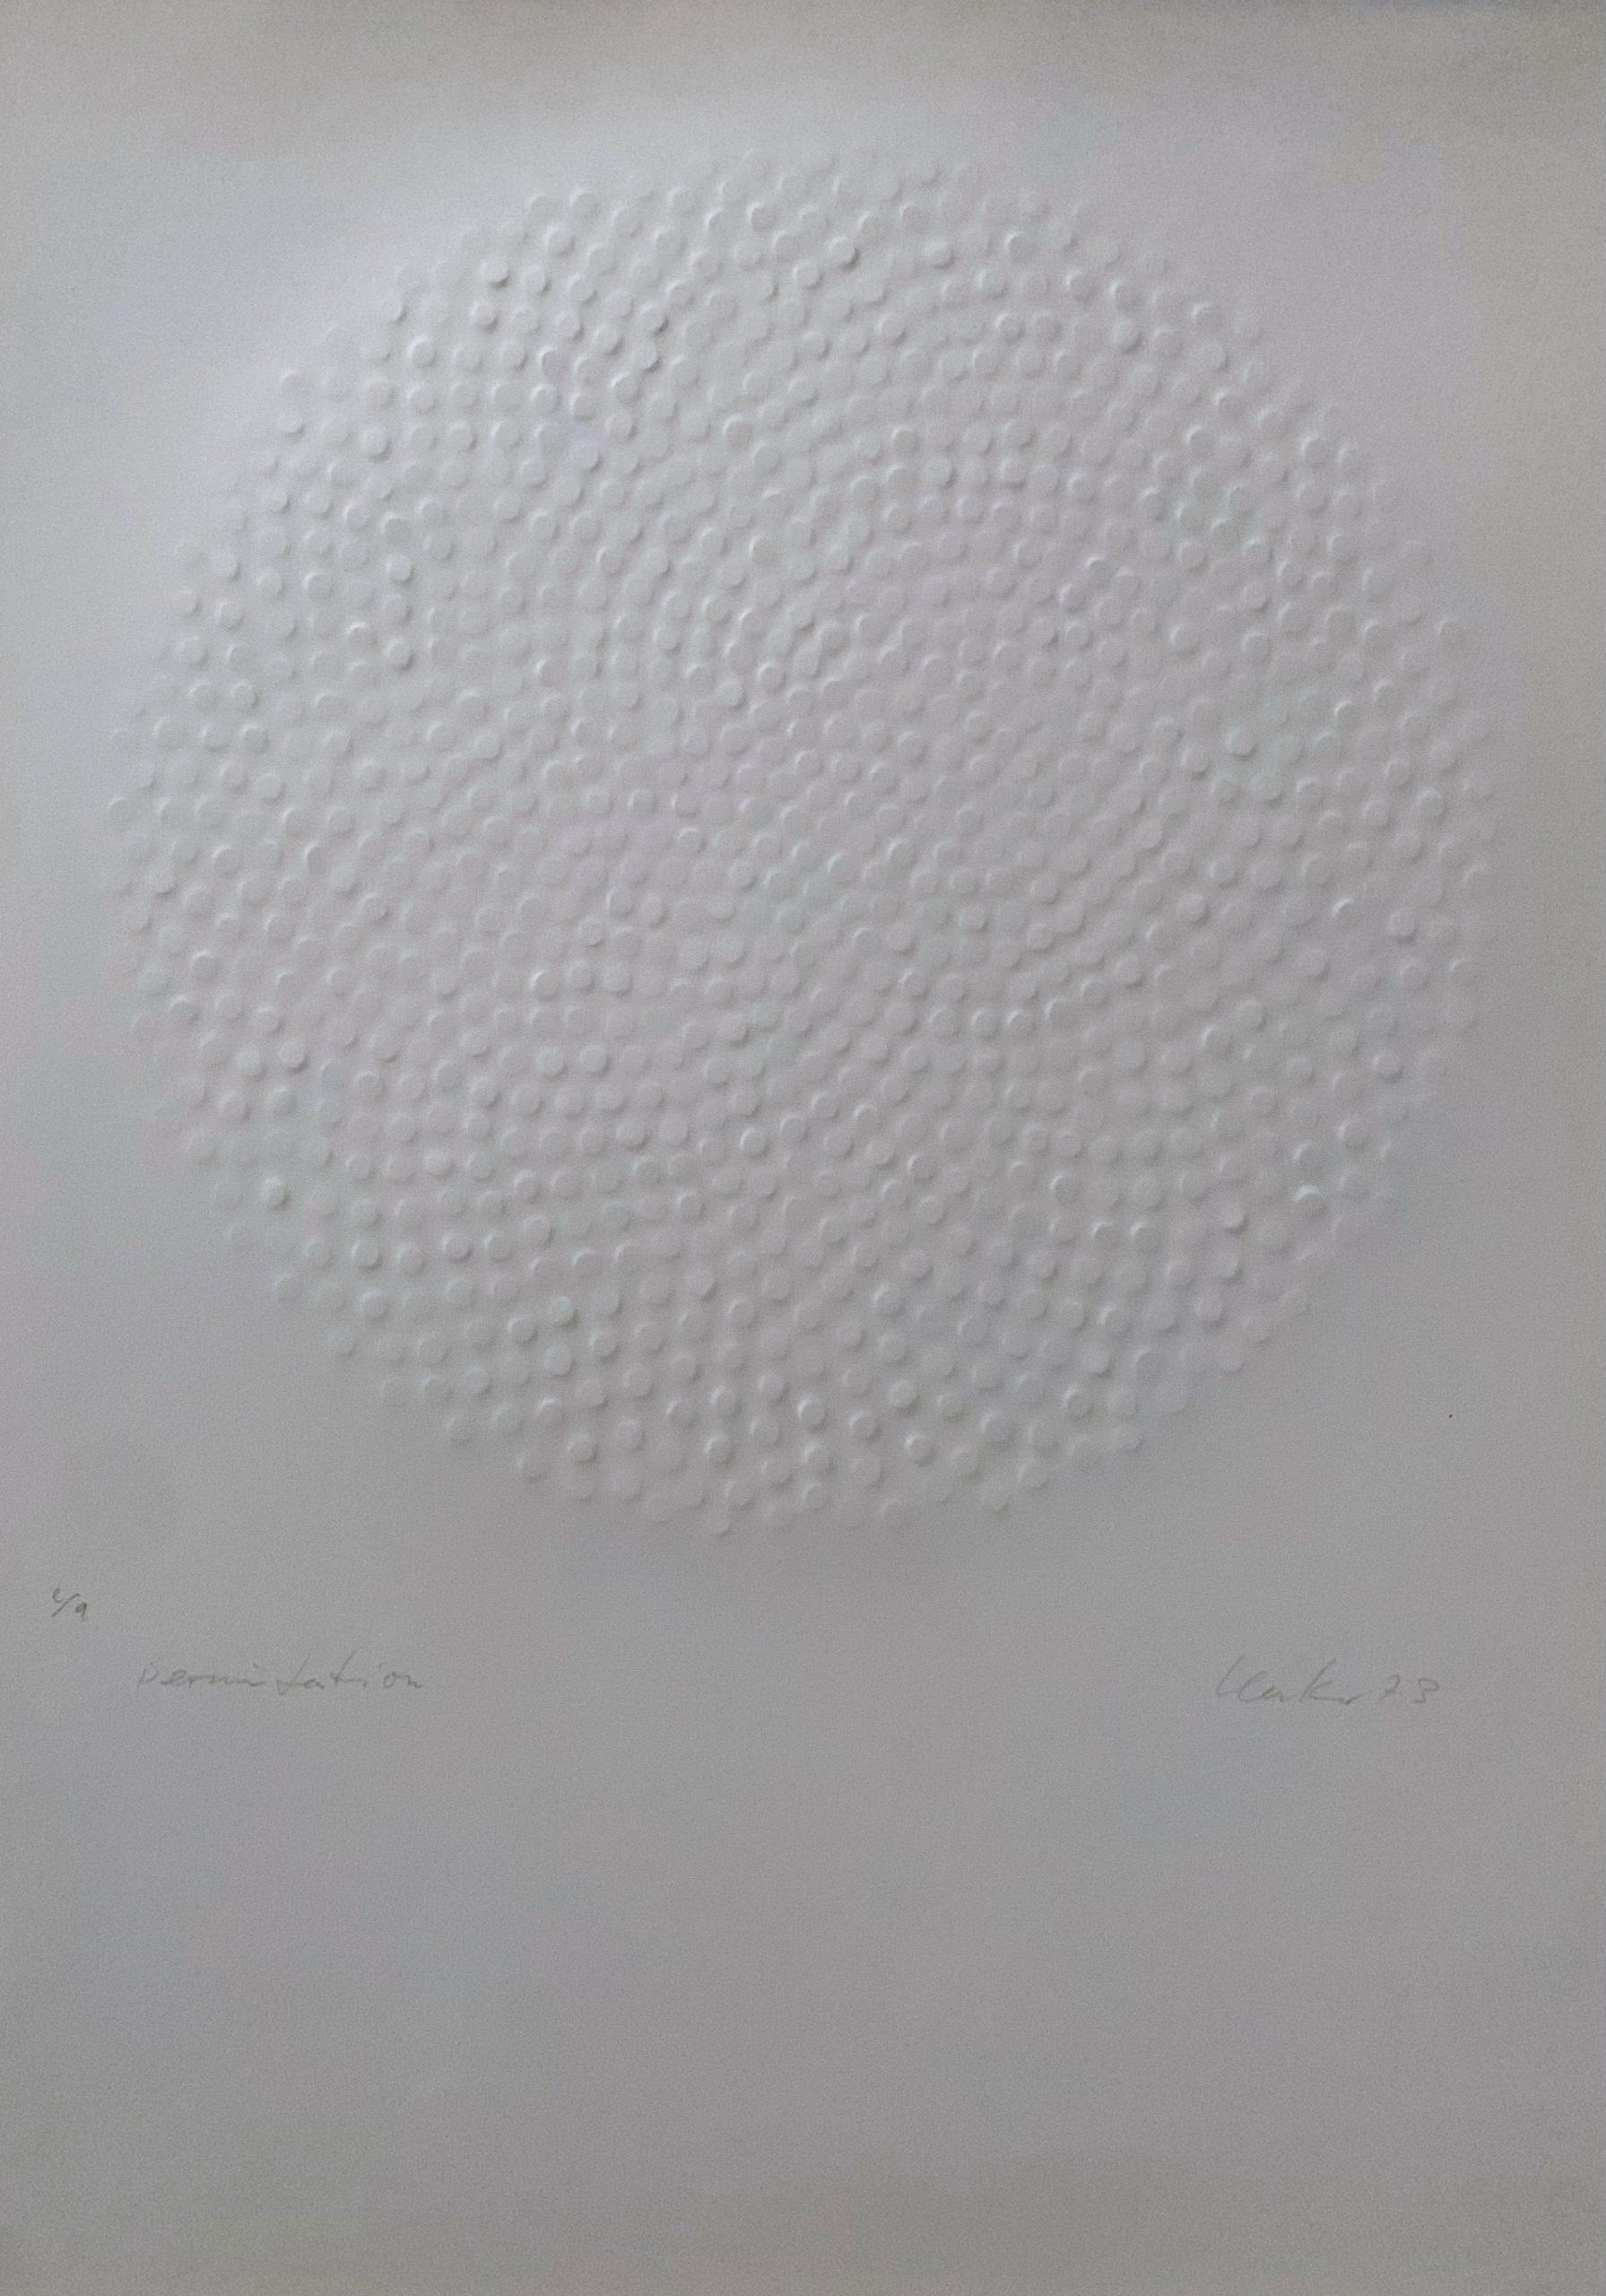 Galerie Maulberger Günter Uecker (1973)